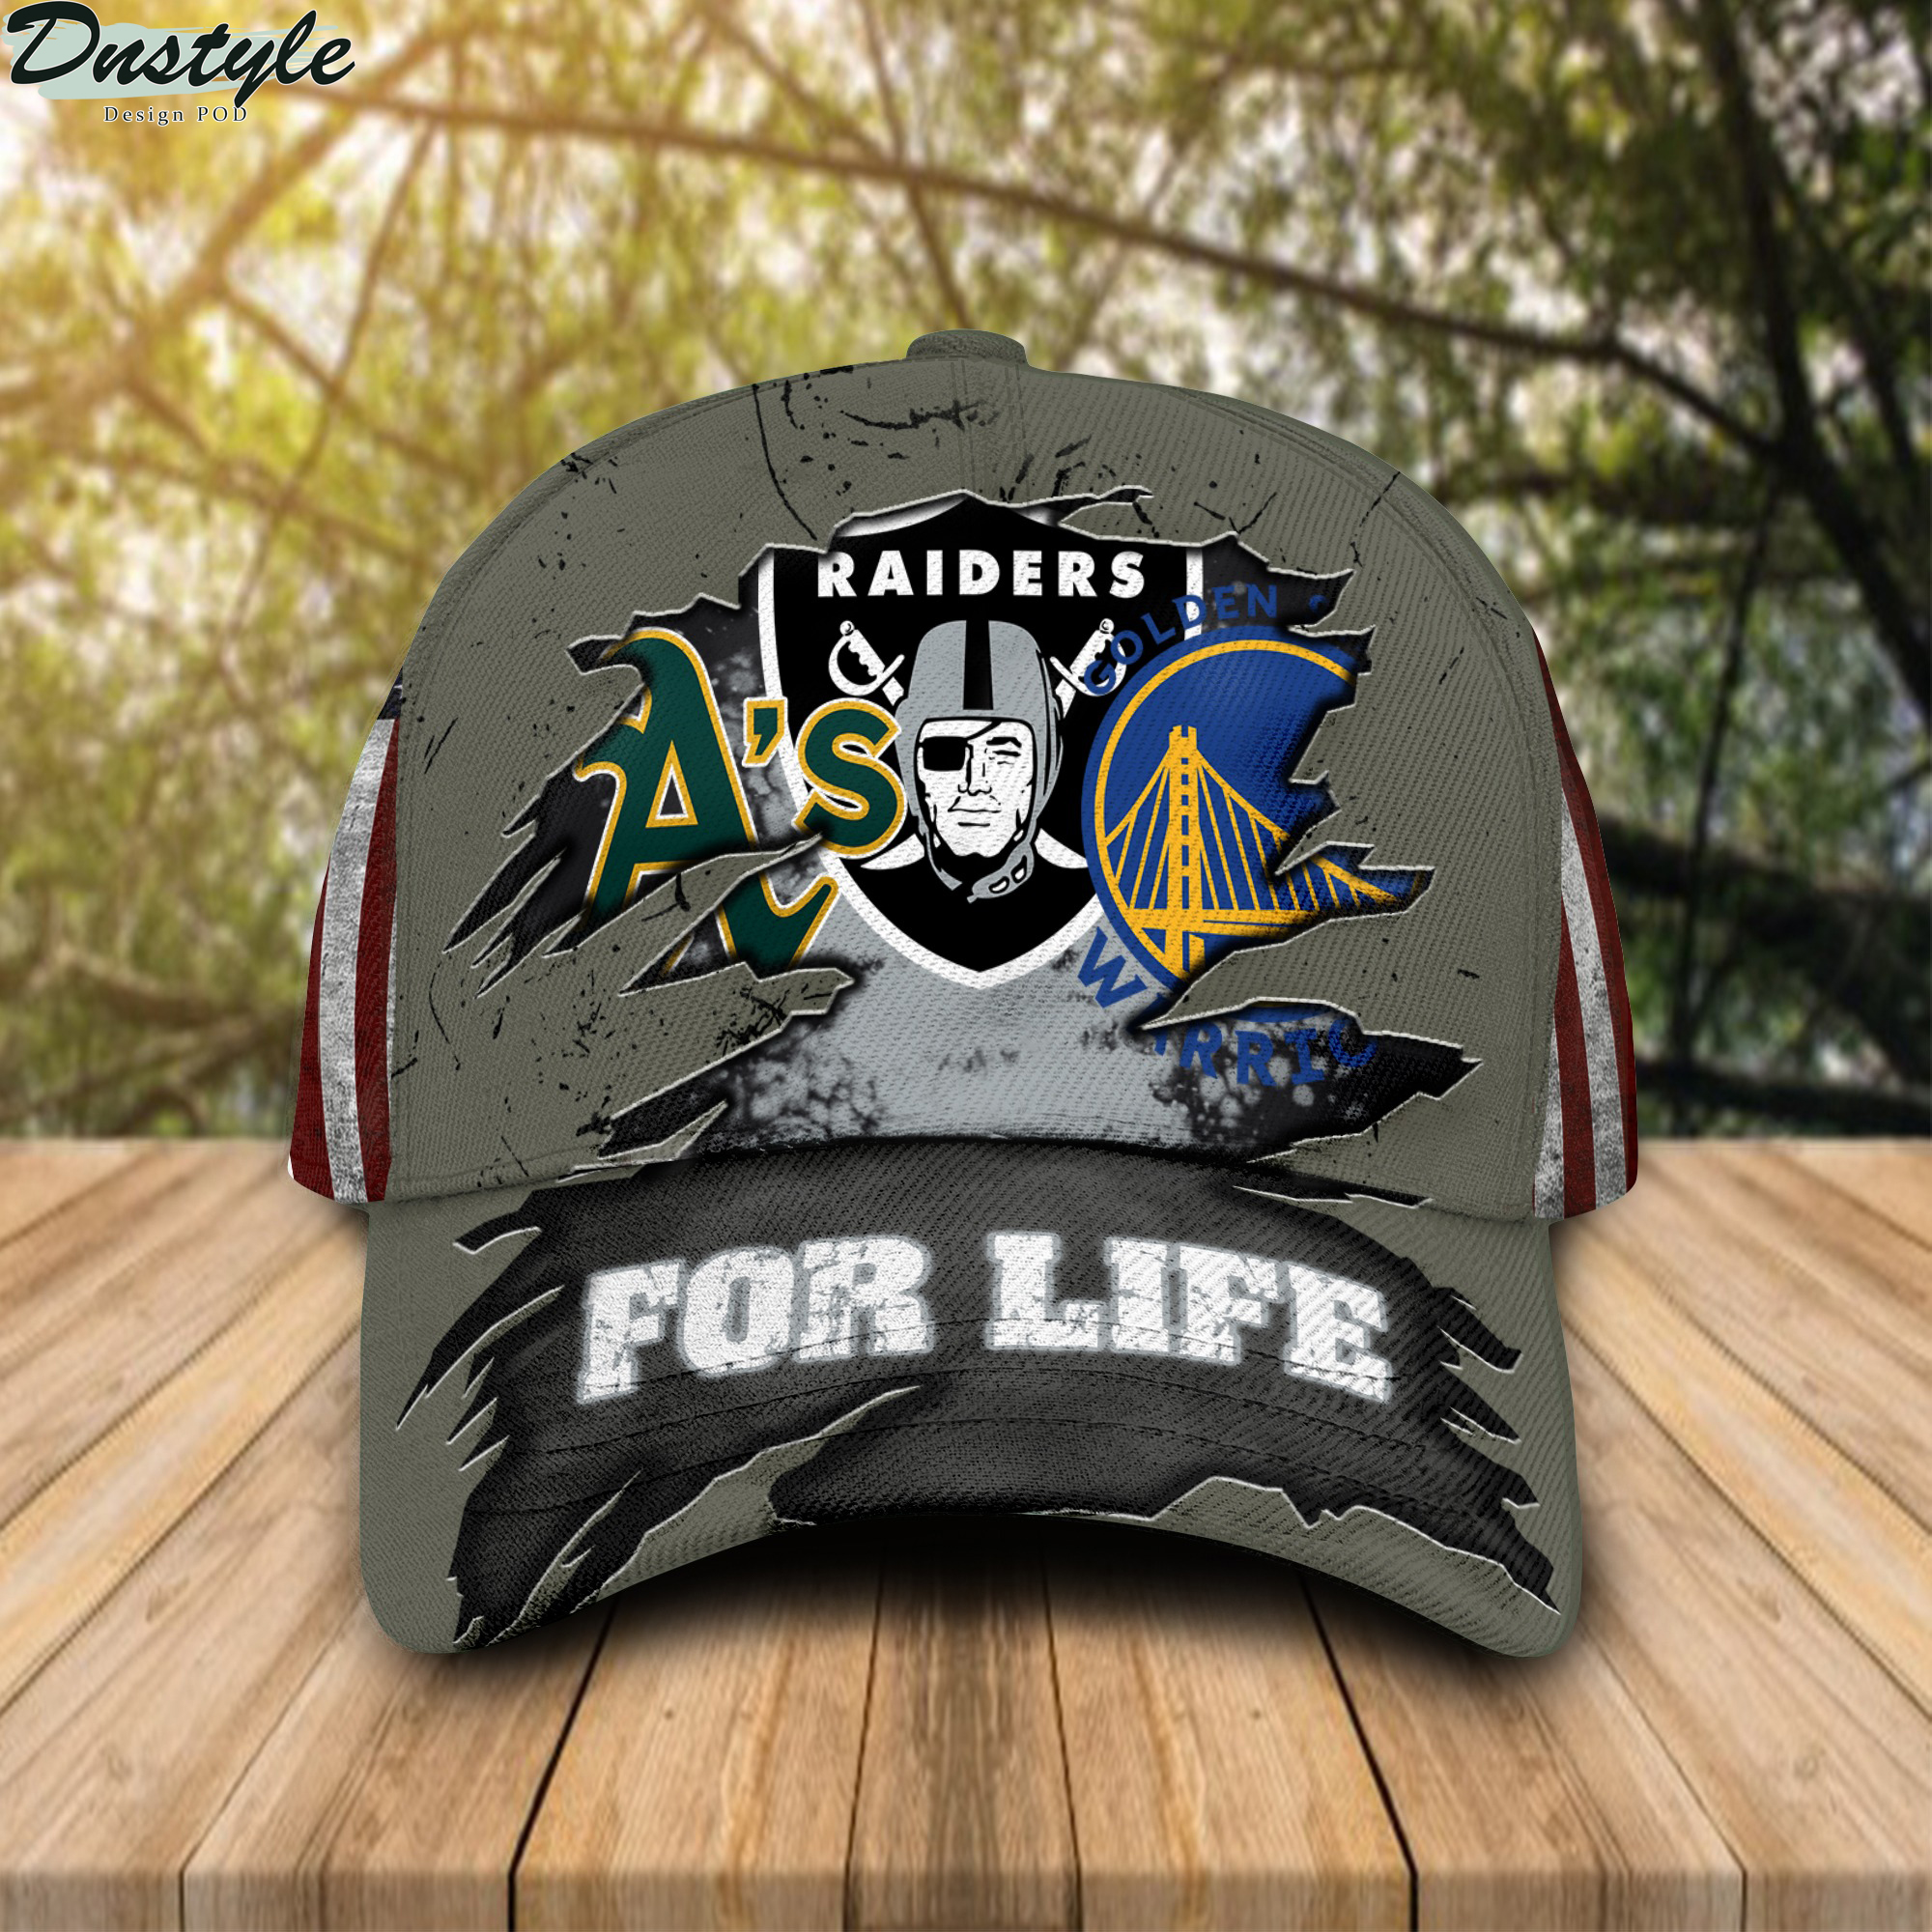 Oakland Athletics Oakland Raiders Golden State Warriors for life cap